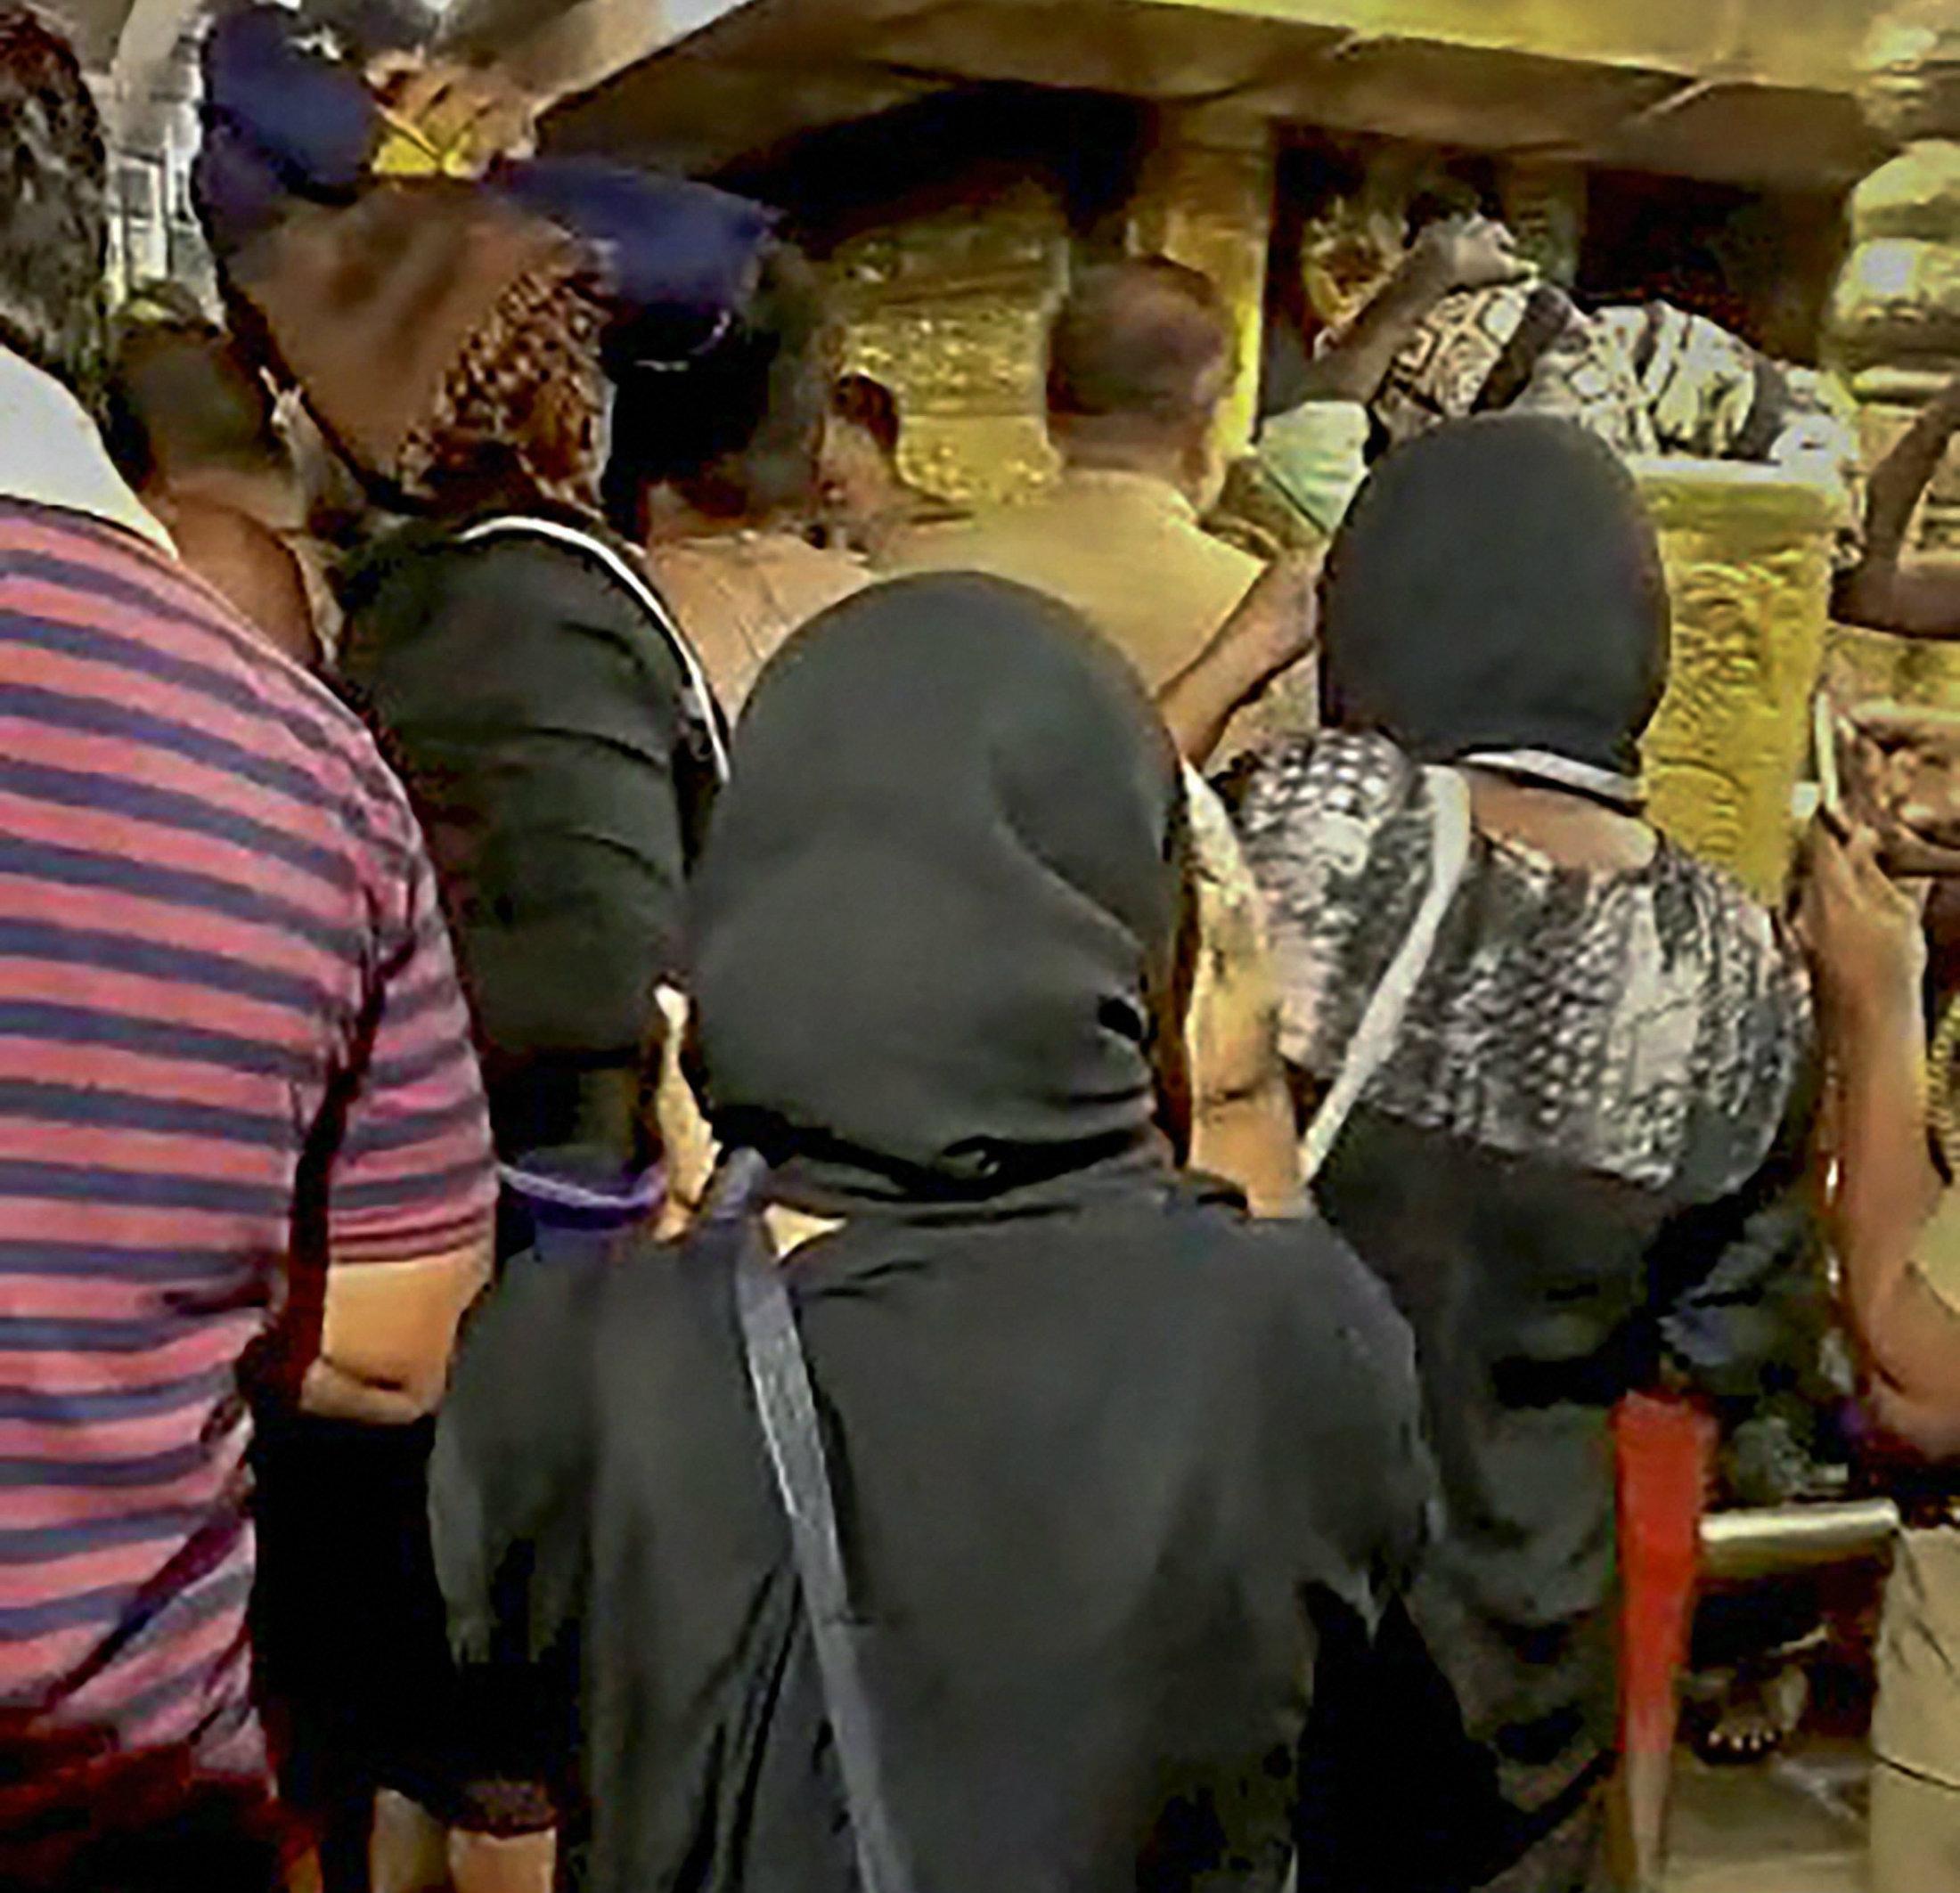 Bindu and Kanakadurga at the Sabarimala temple on Wednesday.